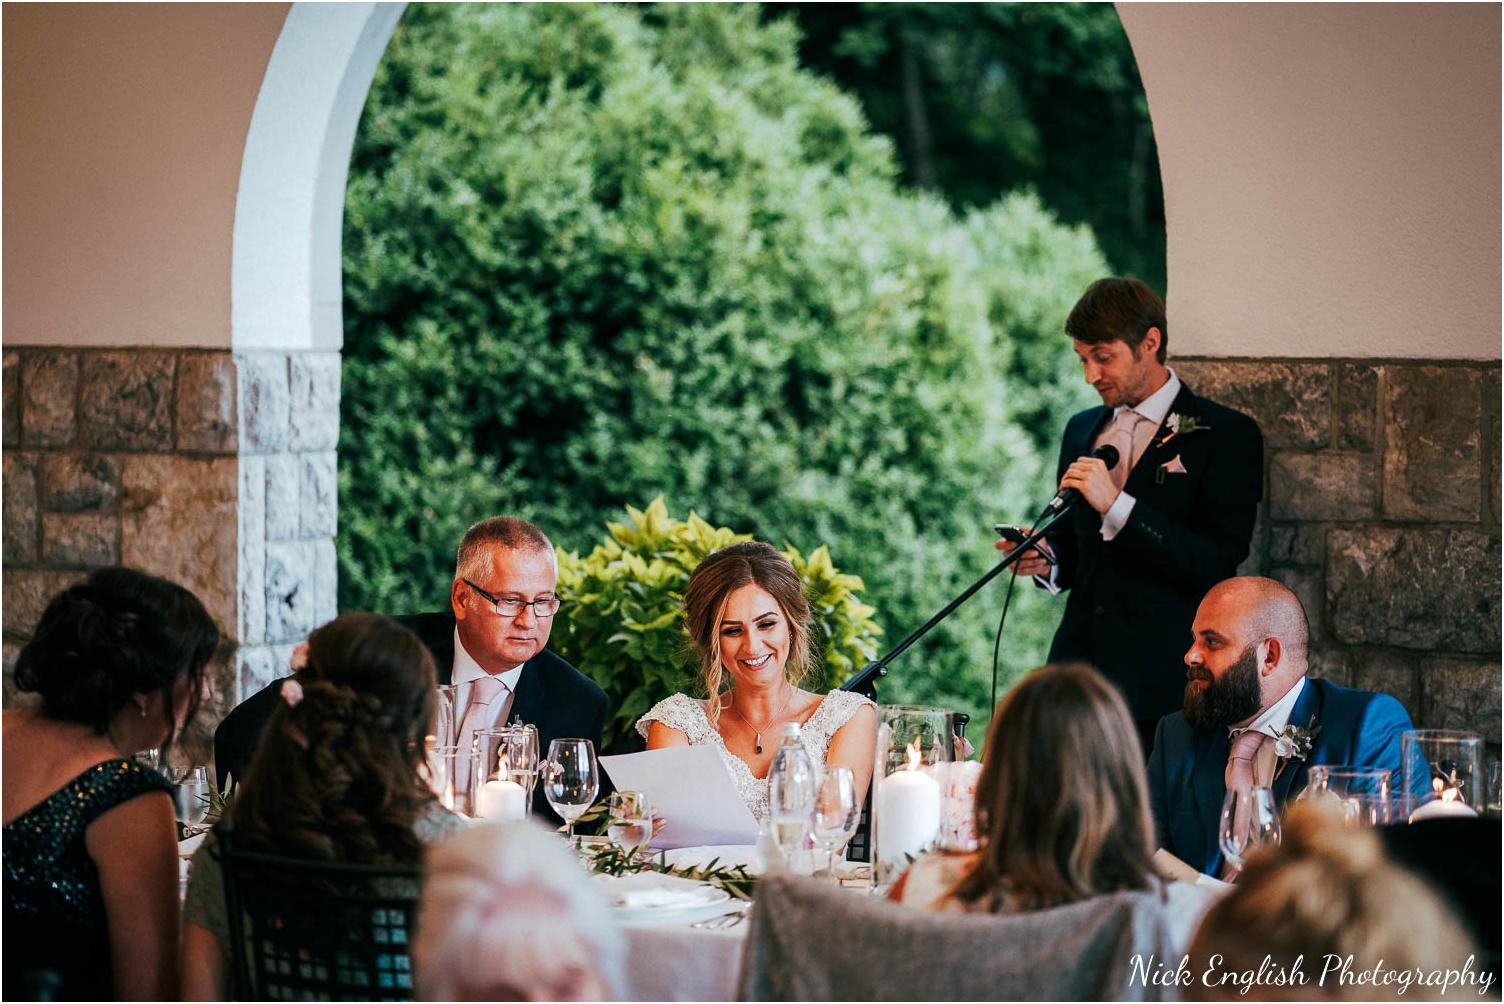 Destination_Wedding_Photographer_Slovenia_Nick_English_Photography-84.jpg